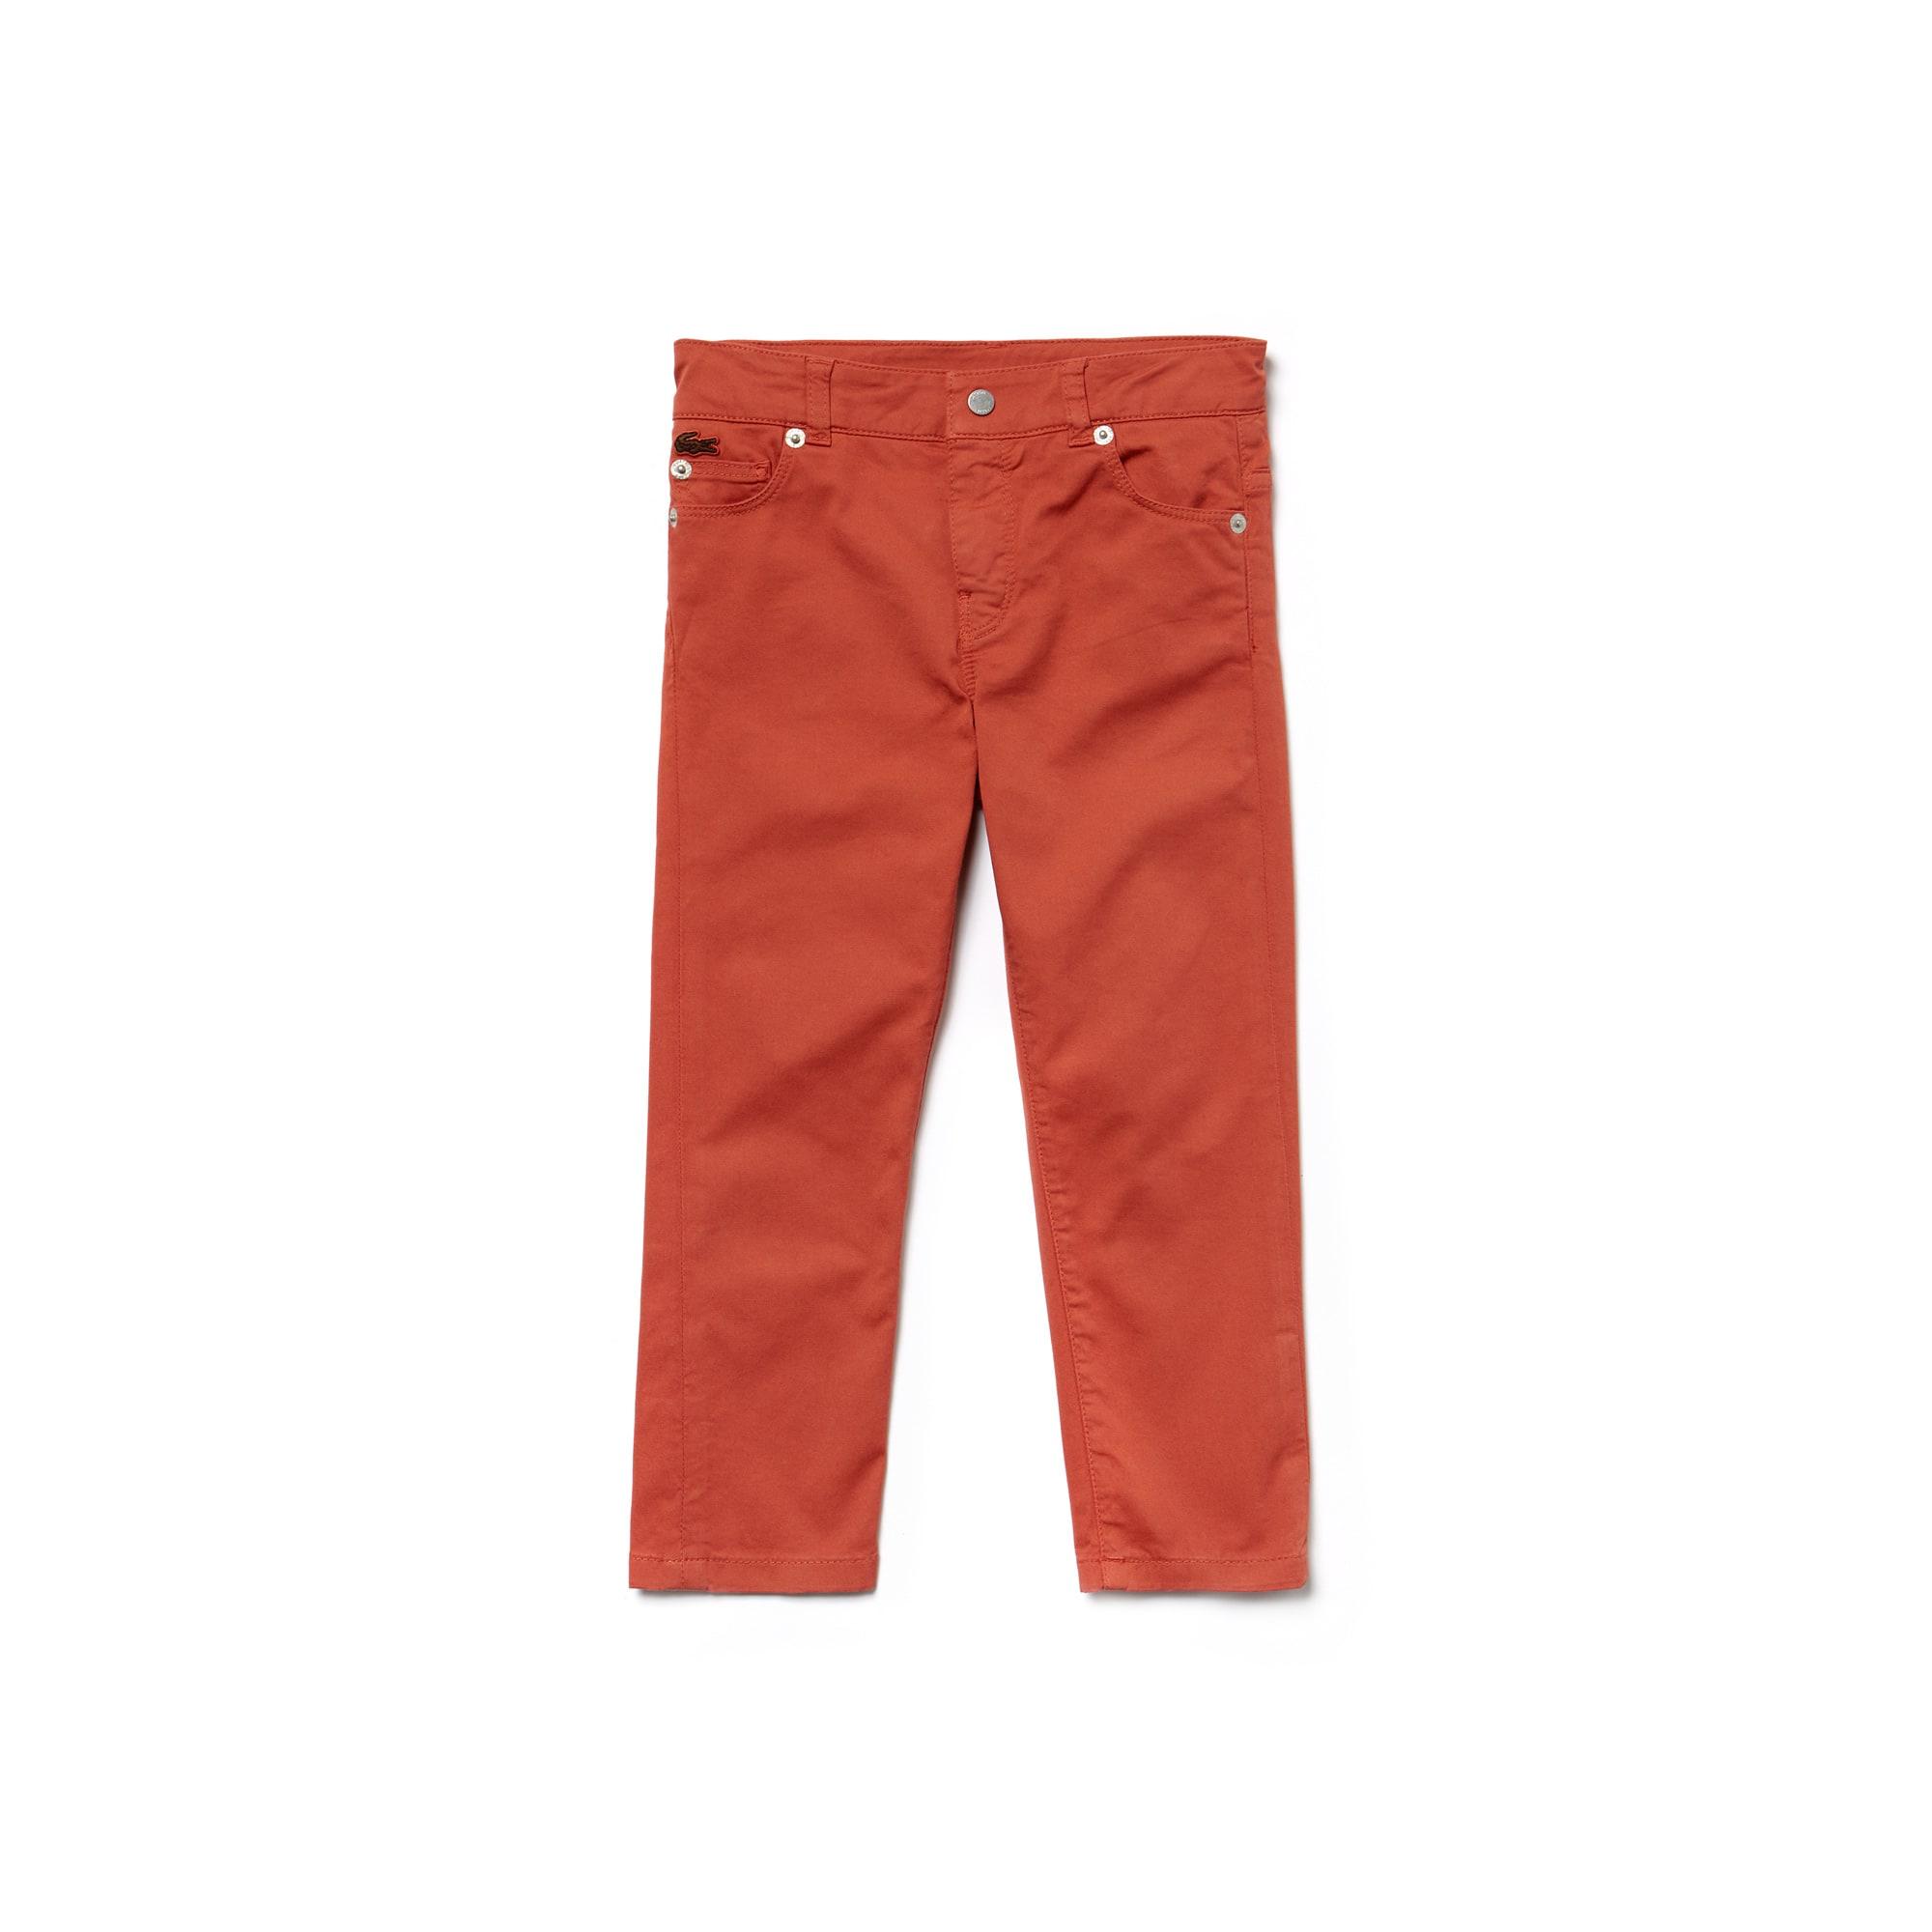 Pantalon Garçon 5 poches en gabardine stretch unie